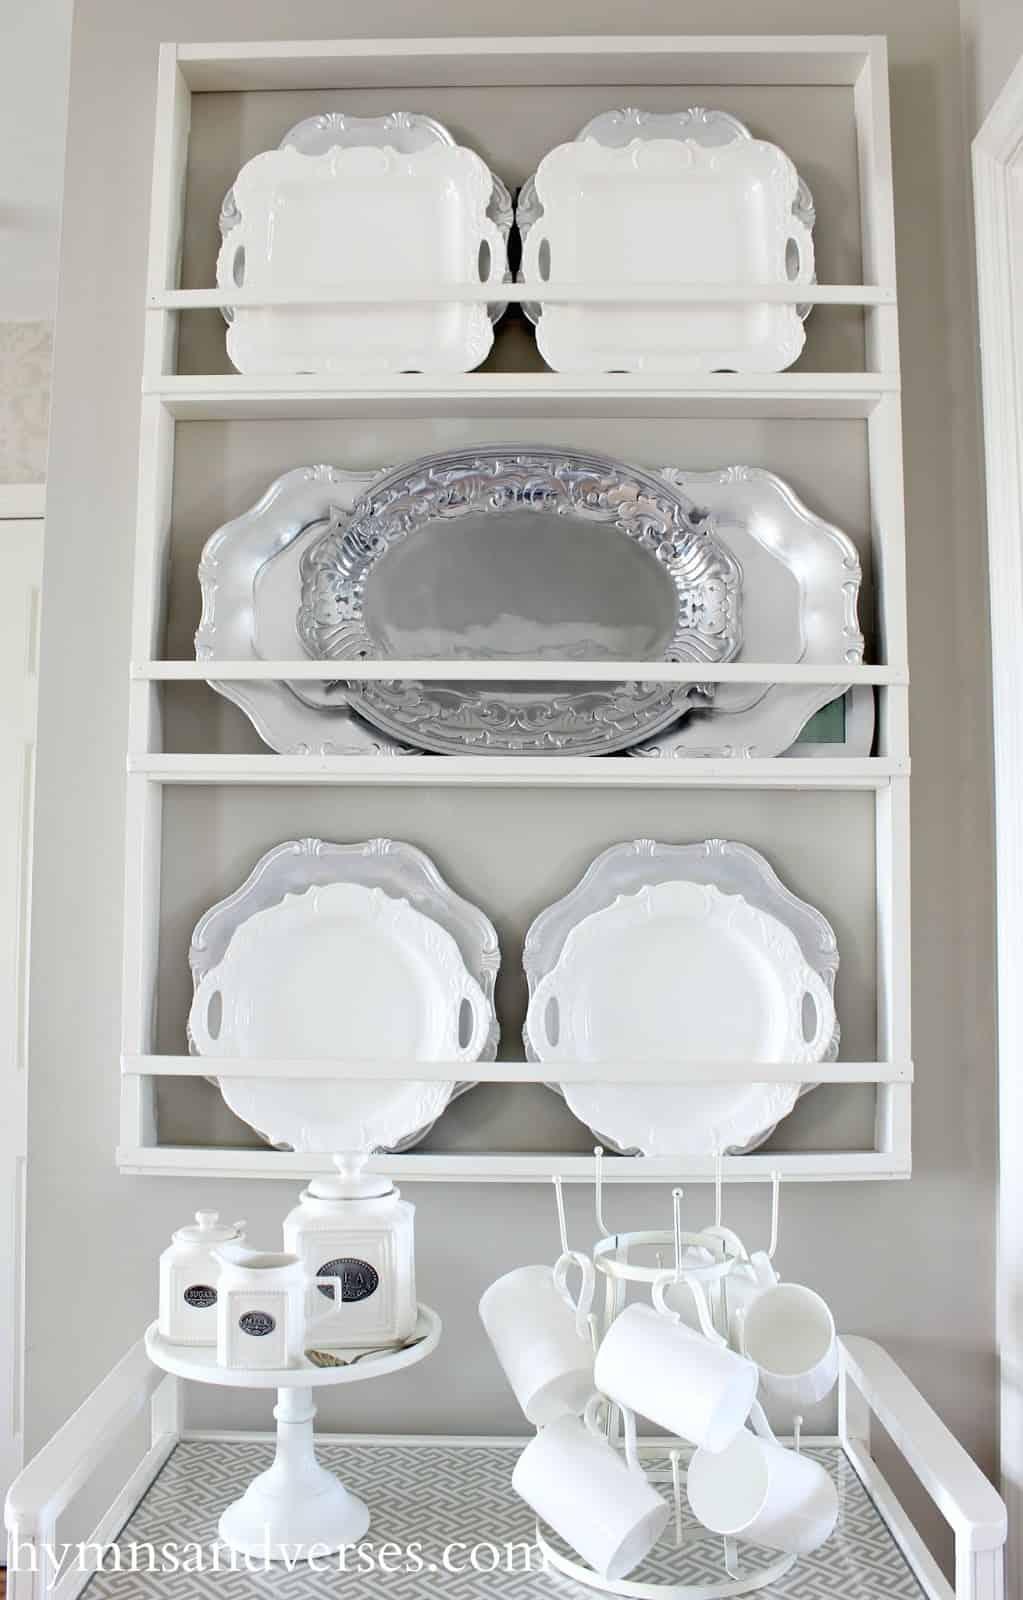 Simplistic vertical plate rack